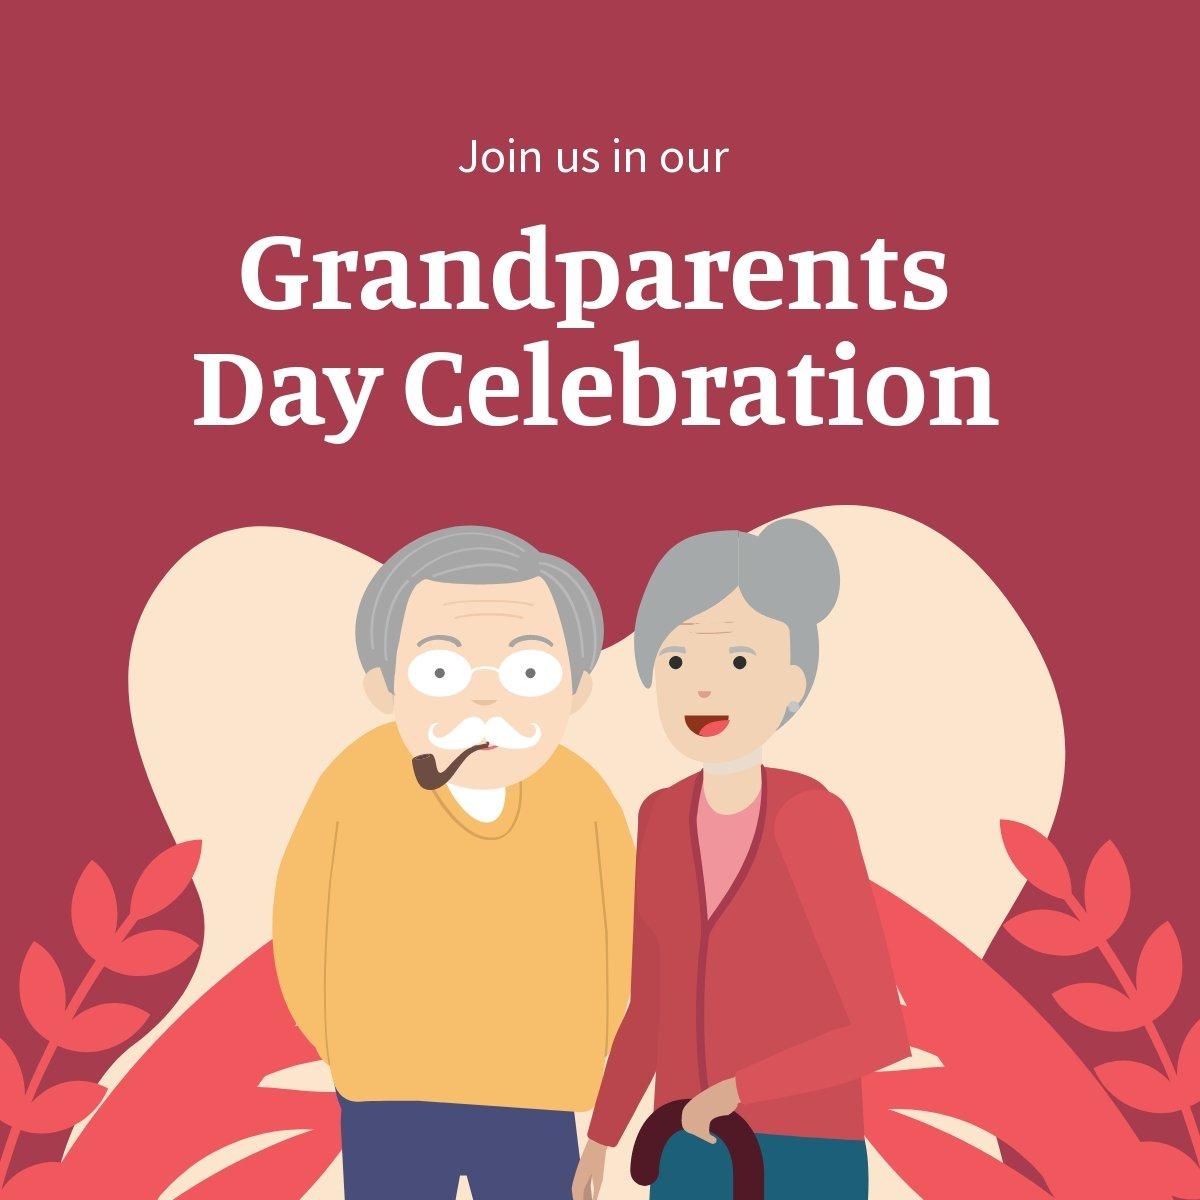 Grandparents Day Invitation Linkedin Post Template.jpe